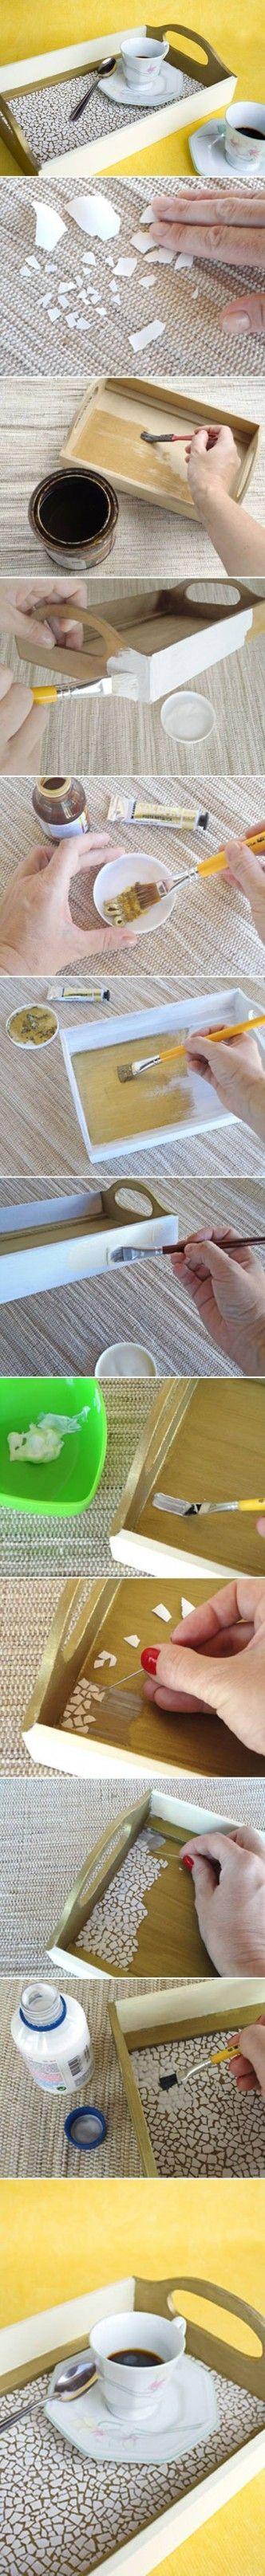 DIY Eggshell Mosaic Tray DIY Projects